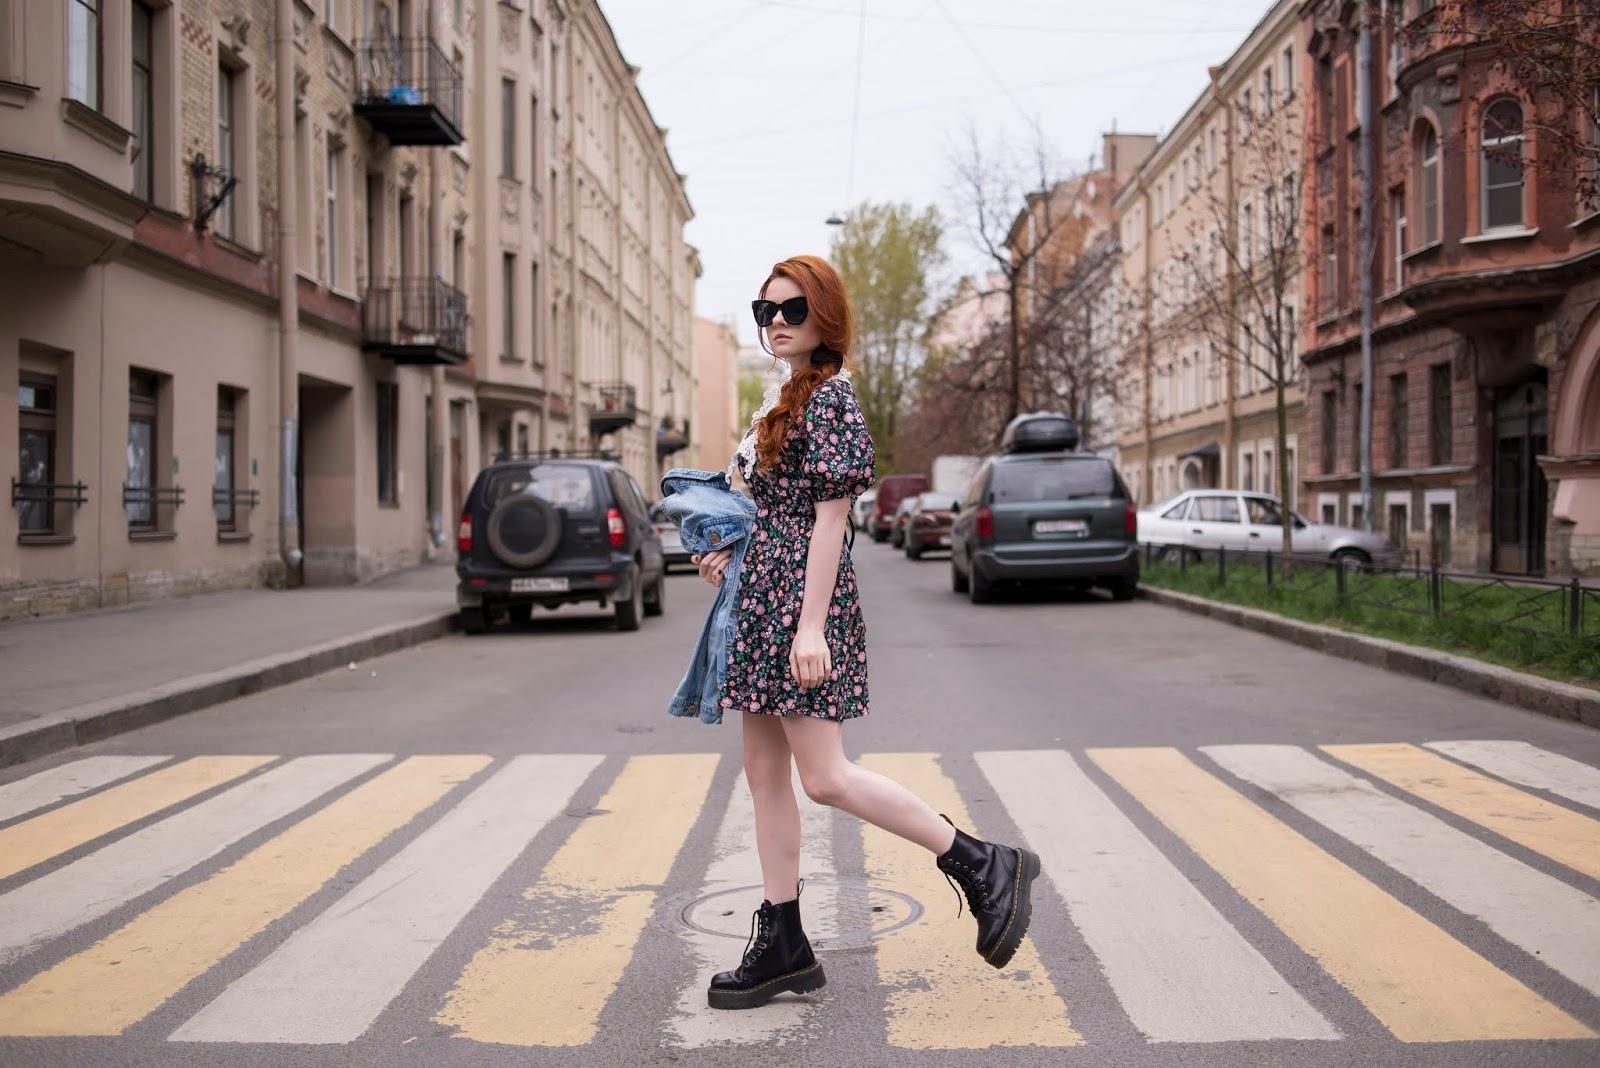 http://www.recklessdiary.ru/2020/05/shein-promokod-skidka-reck15-stil-lady-like-trendy-modnye-platya-2020.html